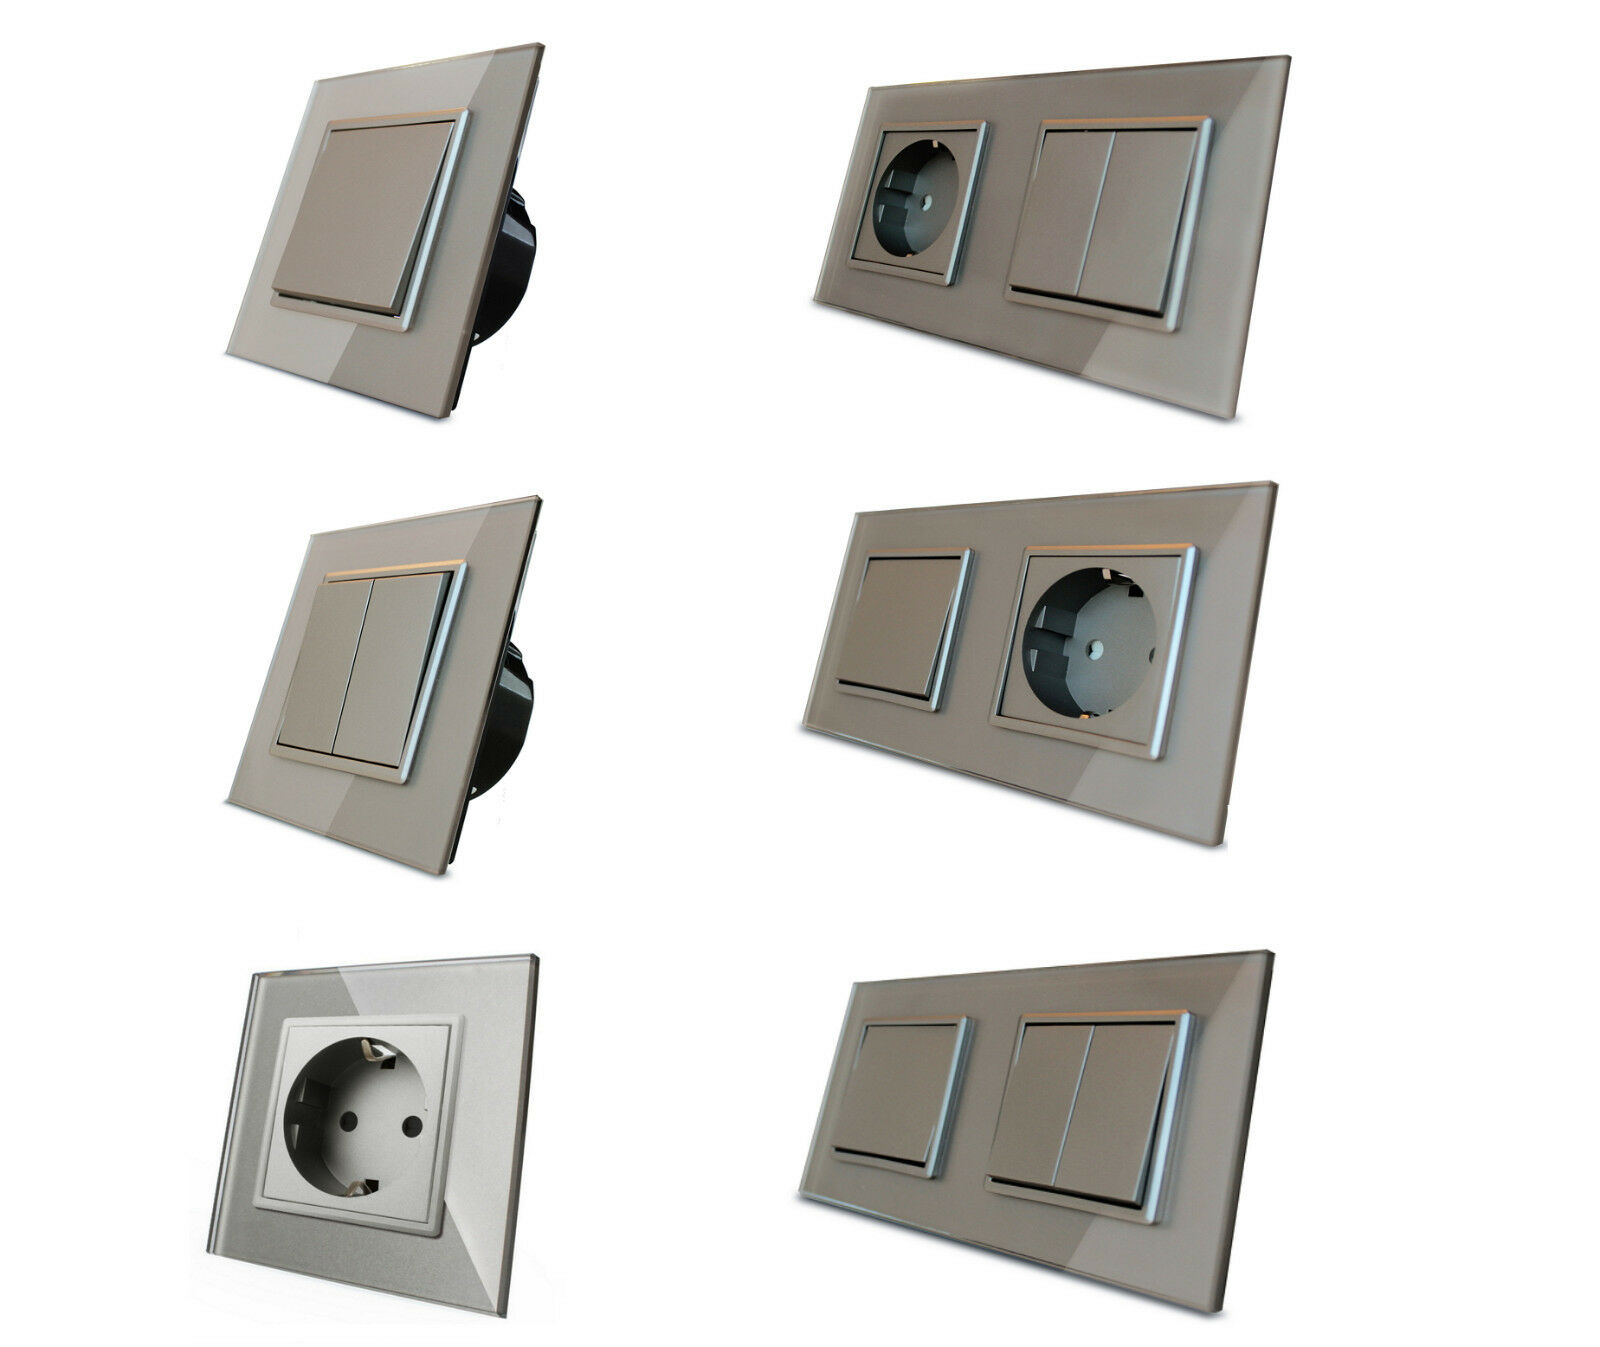 LIVOLO Design Lichtschalter Wandschalter Wippschalter Kippschalter Glas Grau  | Queensland